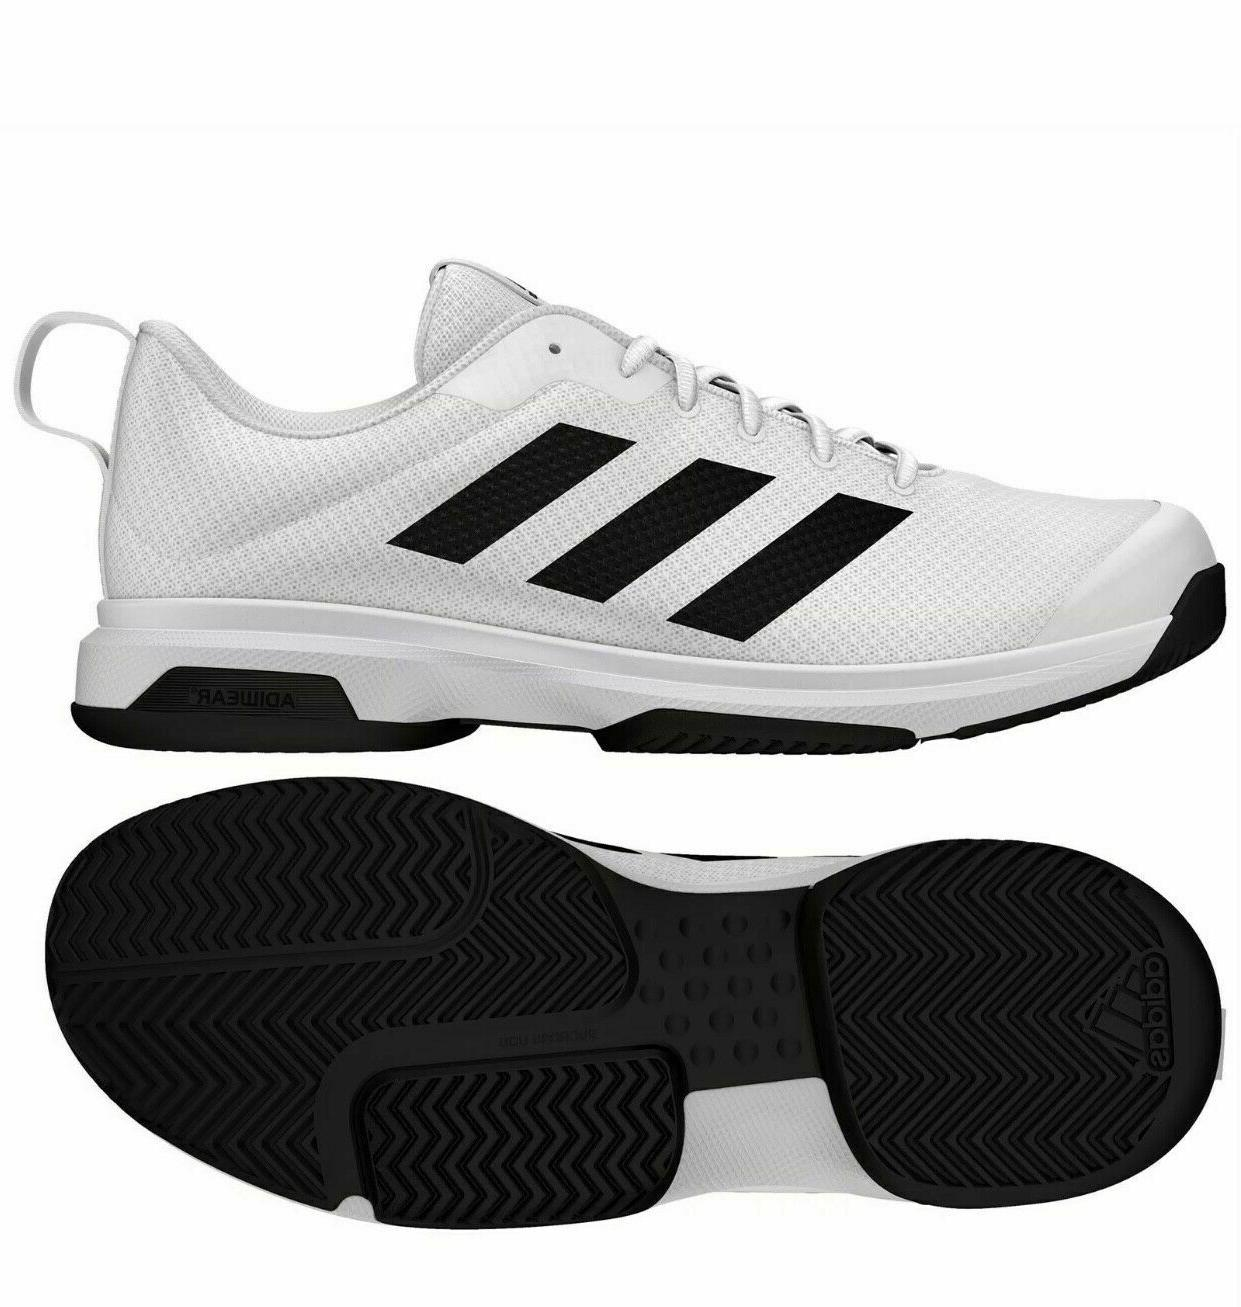 NEW Shoes Sneaker White / Black FX3651